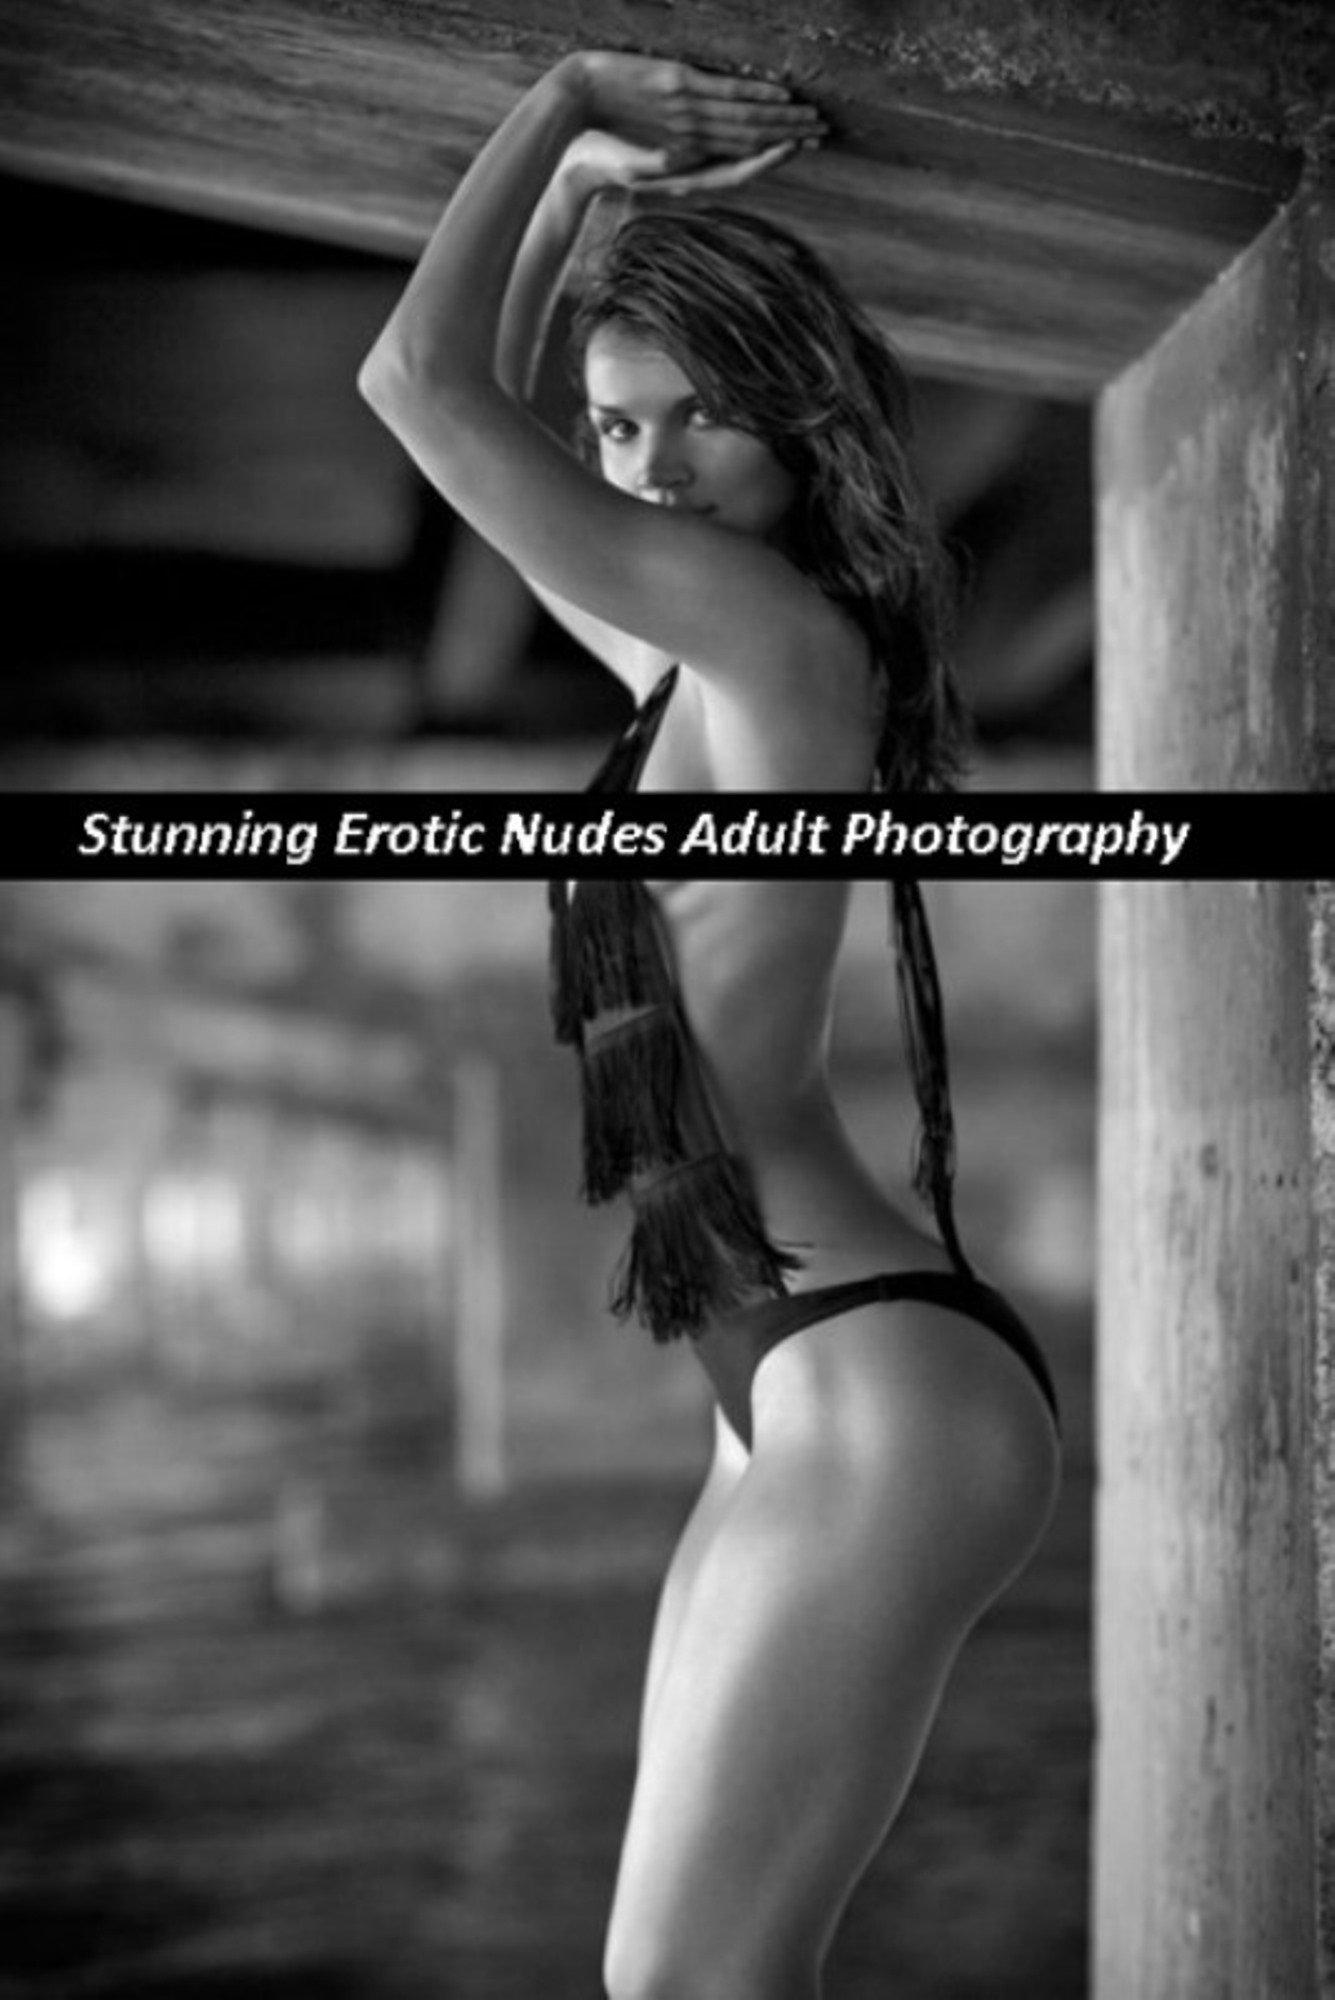 Erotica black and white photos